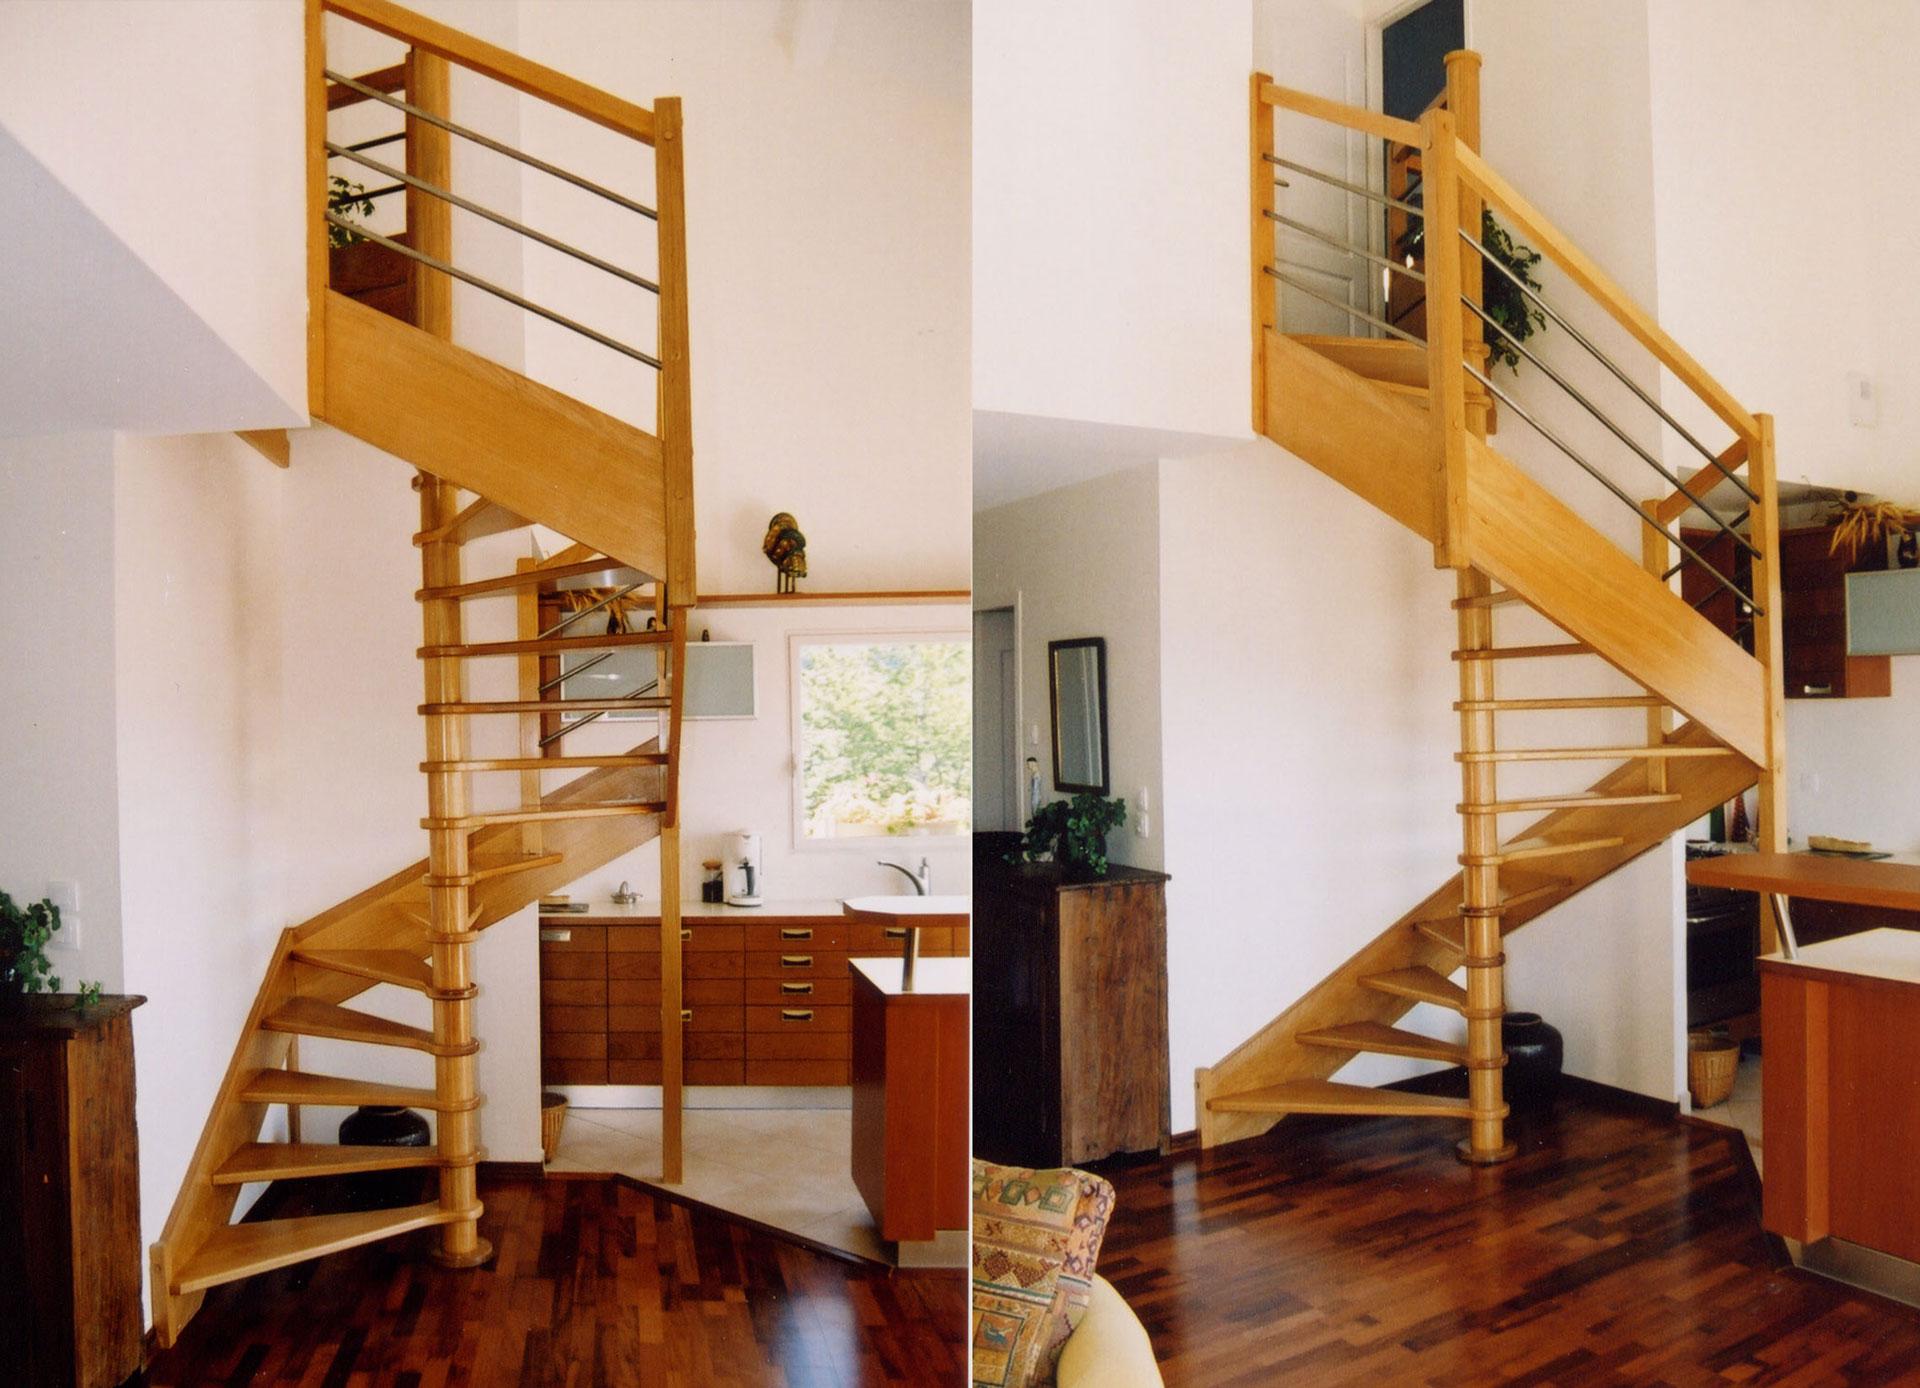 escalier 2 4 tournant mb escaliers. Black Bedroom Furniture Sets. Home Design Ideas